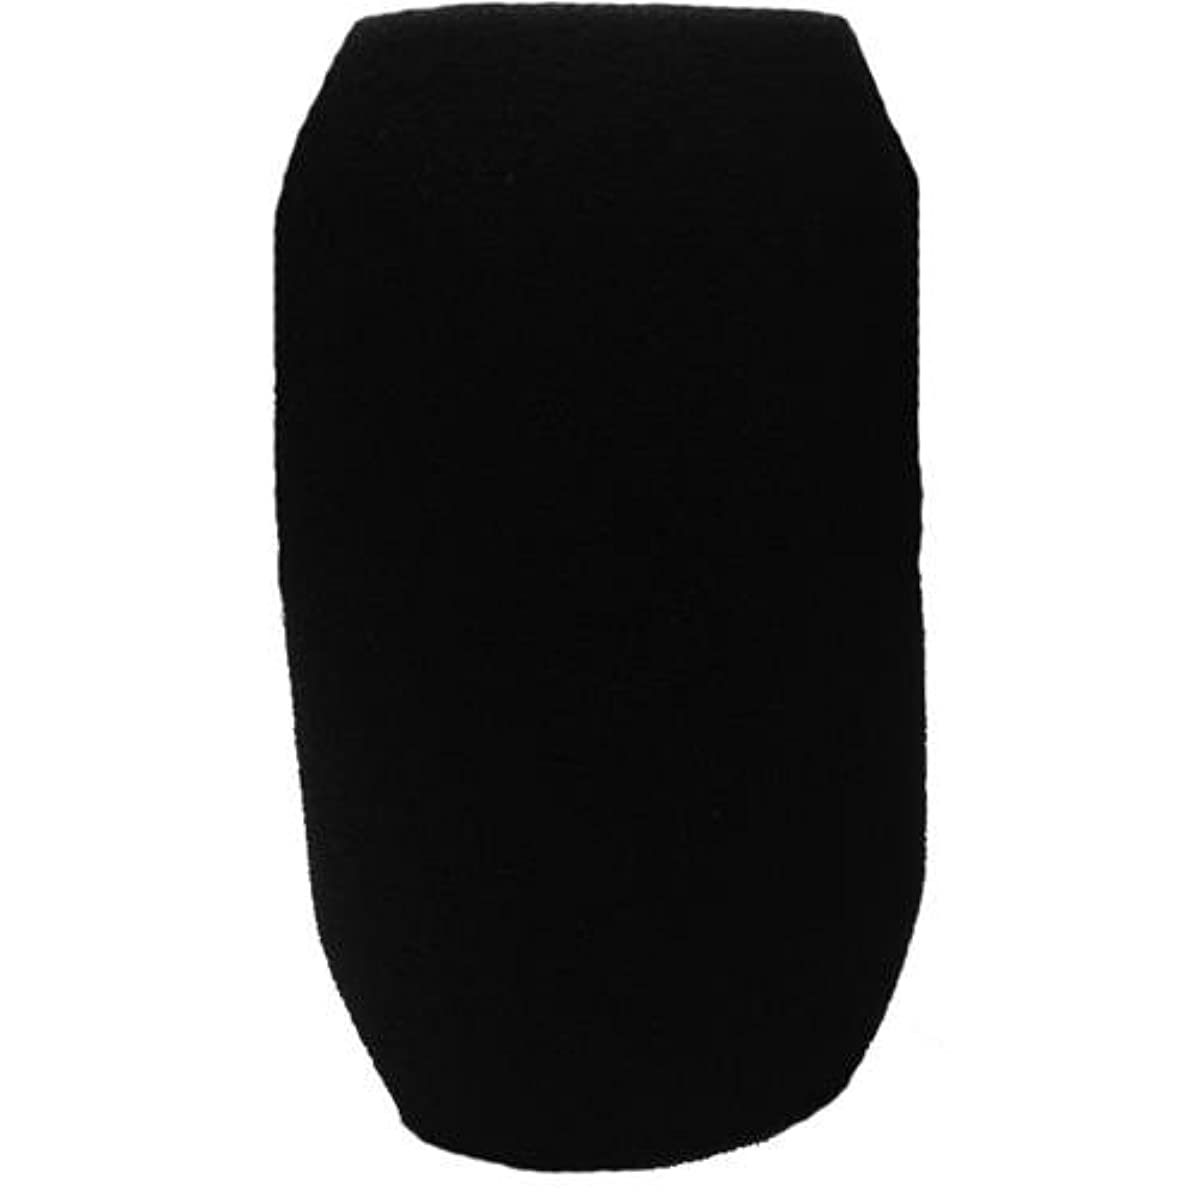 Electro-Voice WS-PC1 Windscreen for PolarChoice Gooseneck Microphones